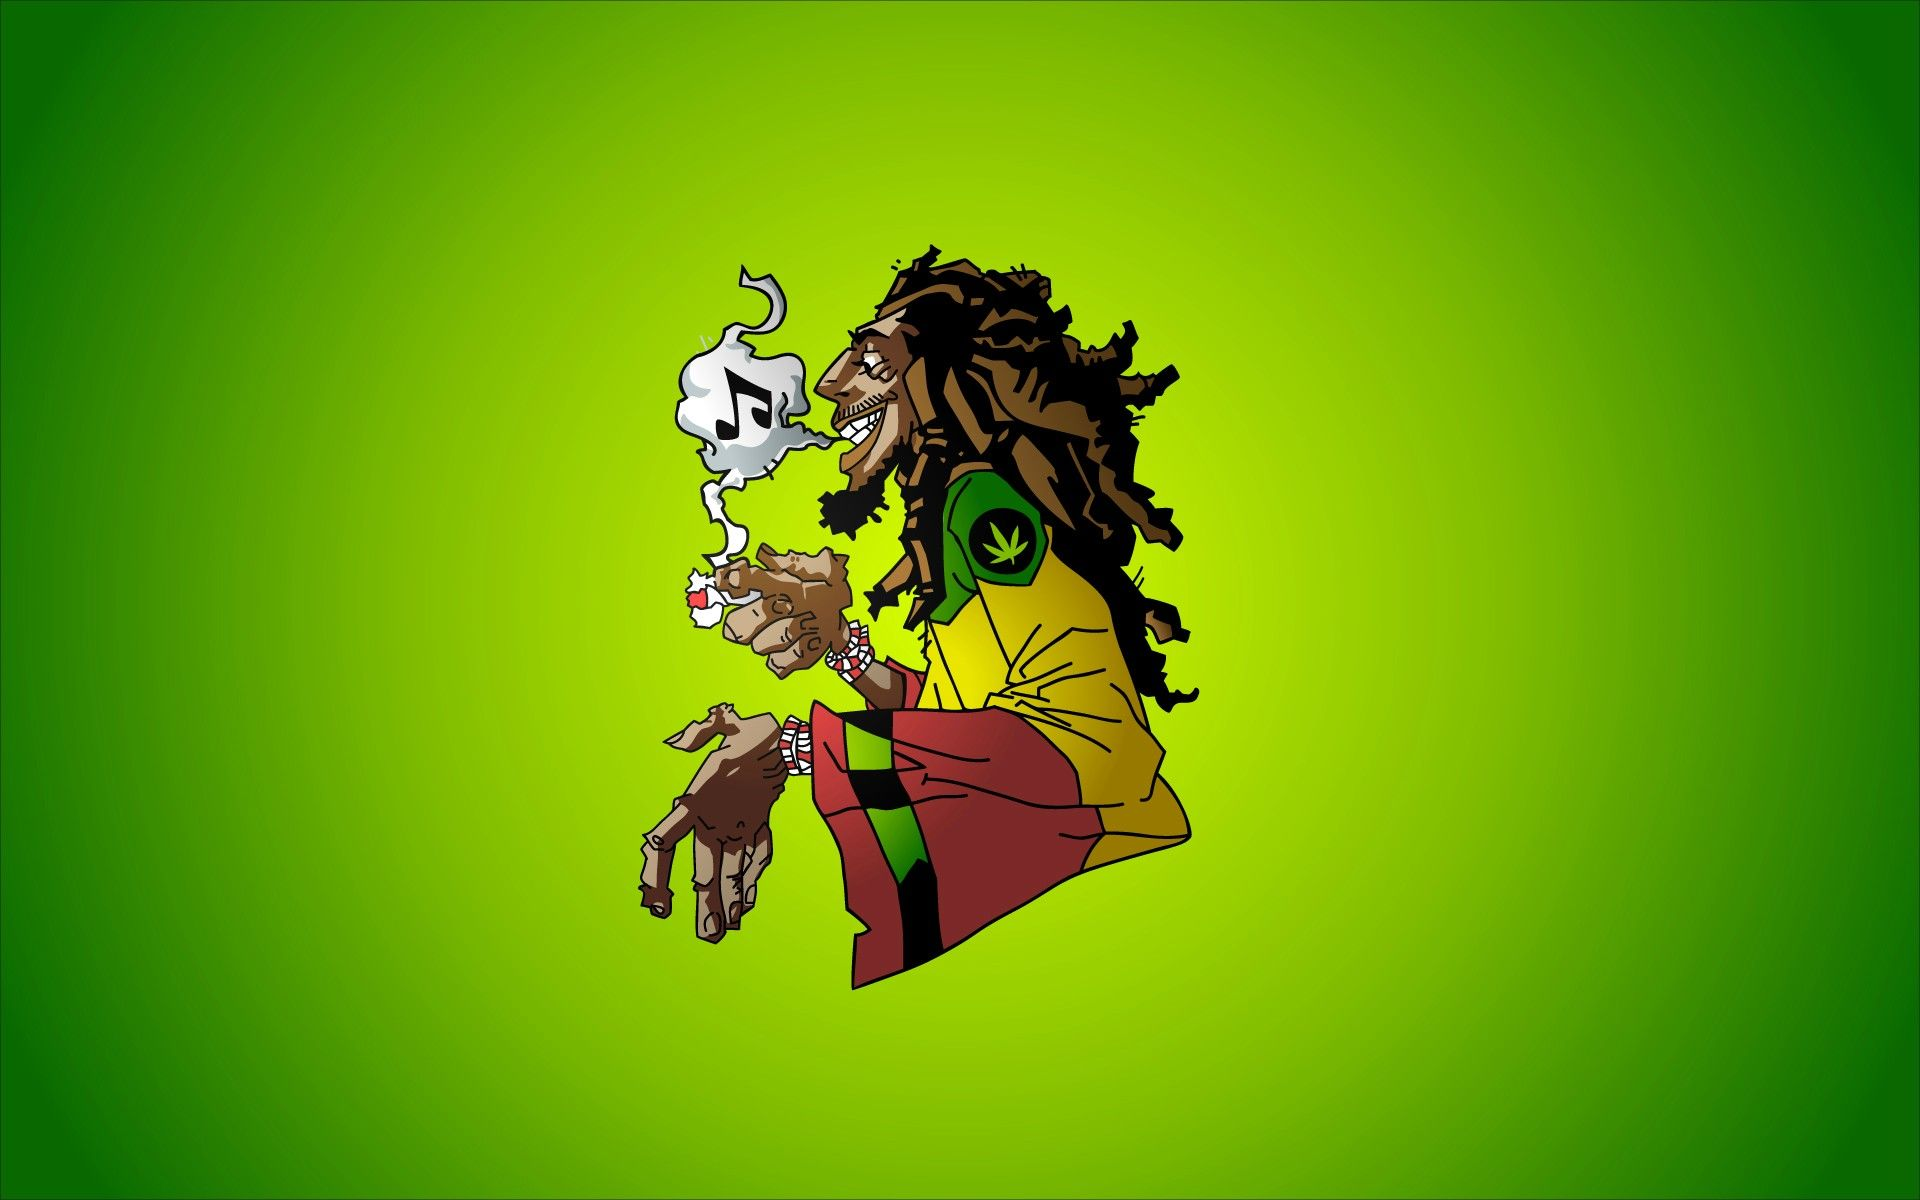 Google themes weed - Female Cartoons Smoking Weed Weed Desktop Backgrounds 11 Weed Desktop Backgrounds 12